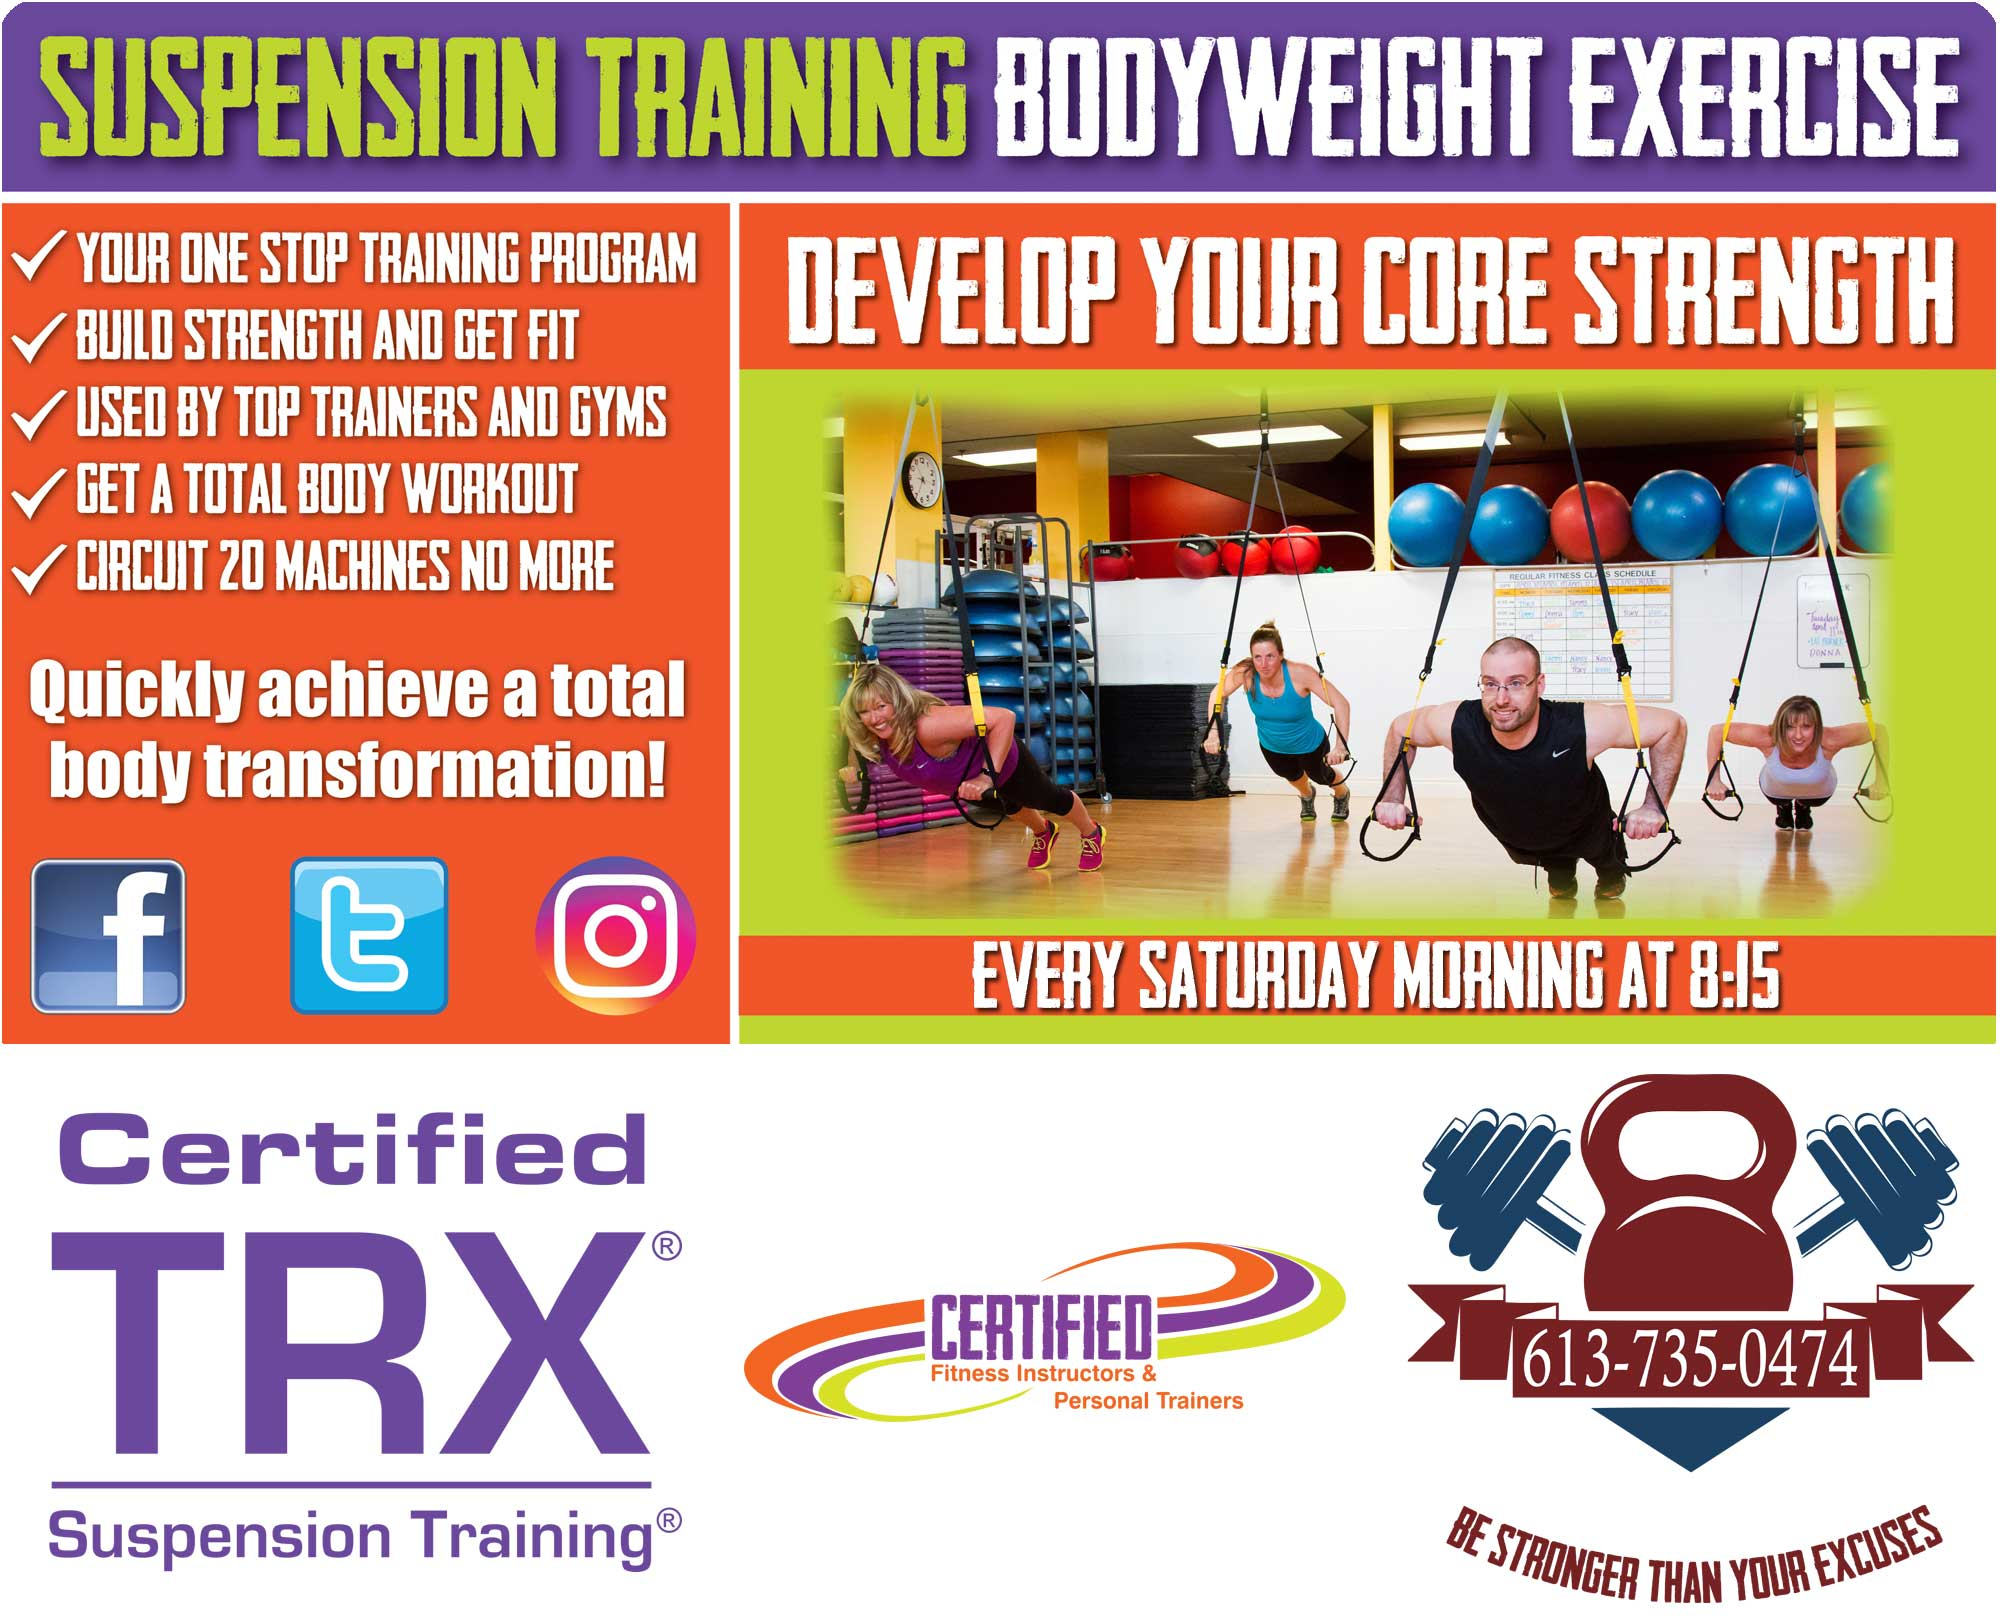 TRX Training for Core Strength